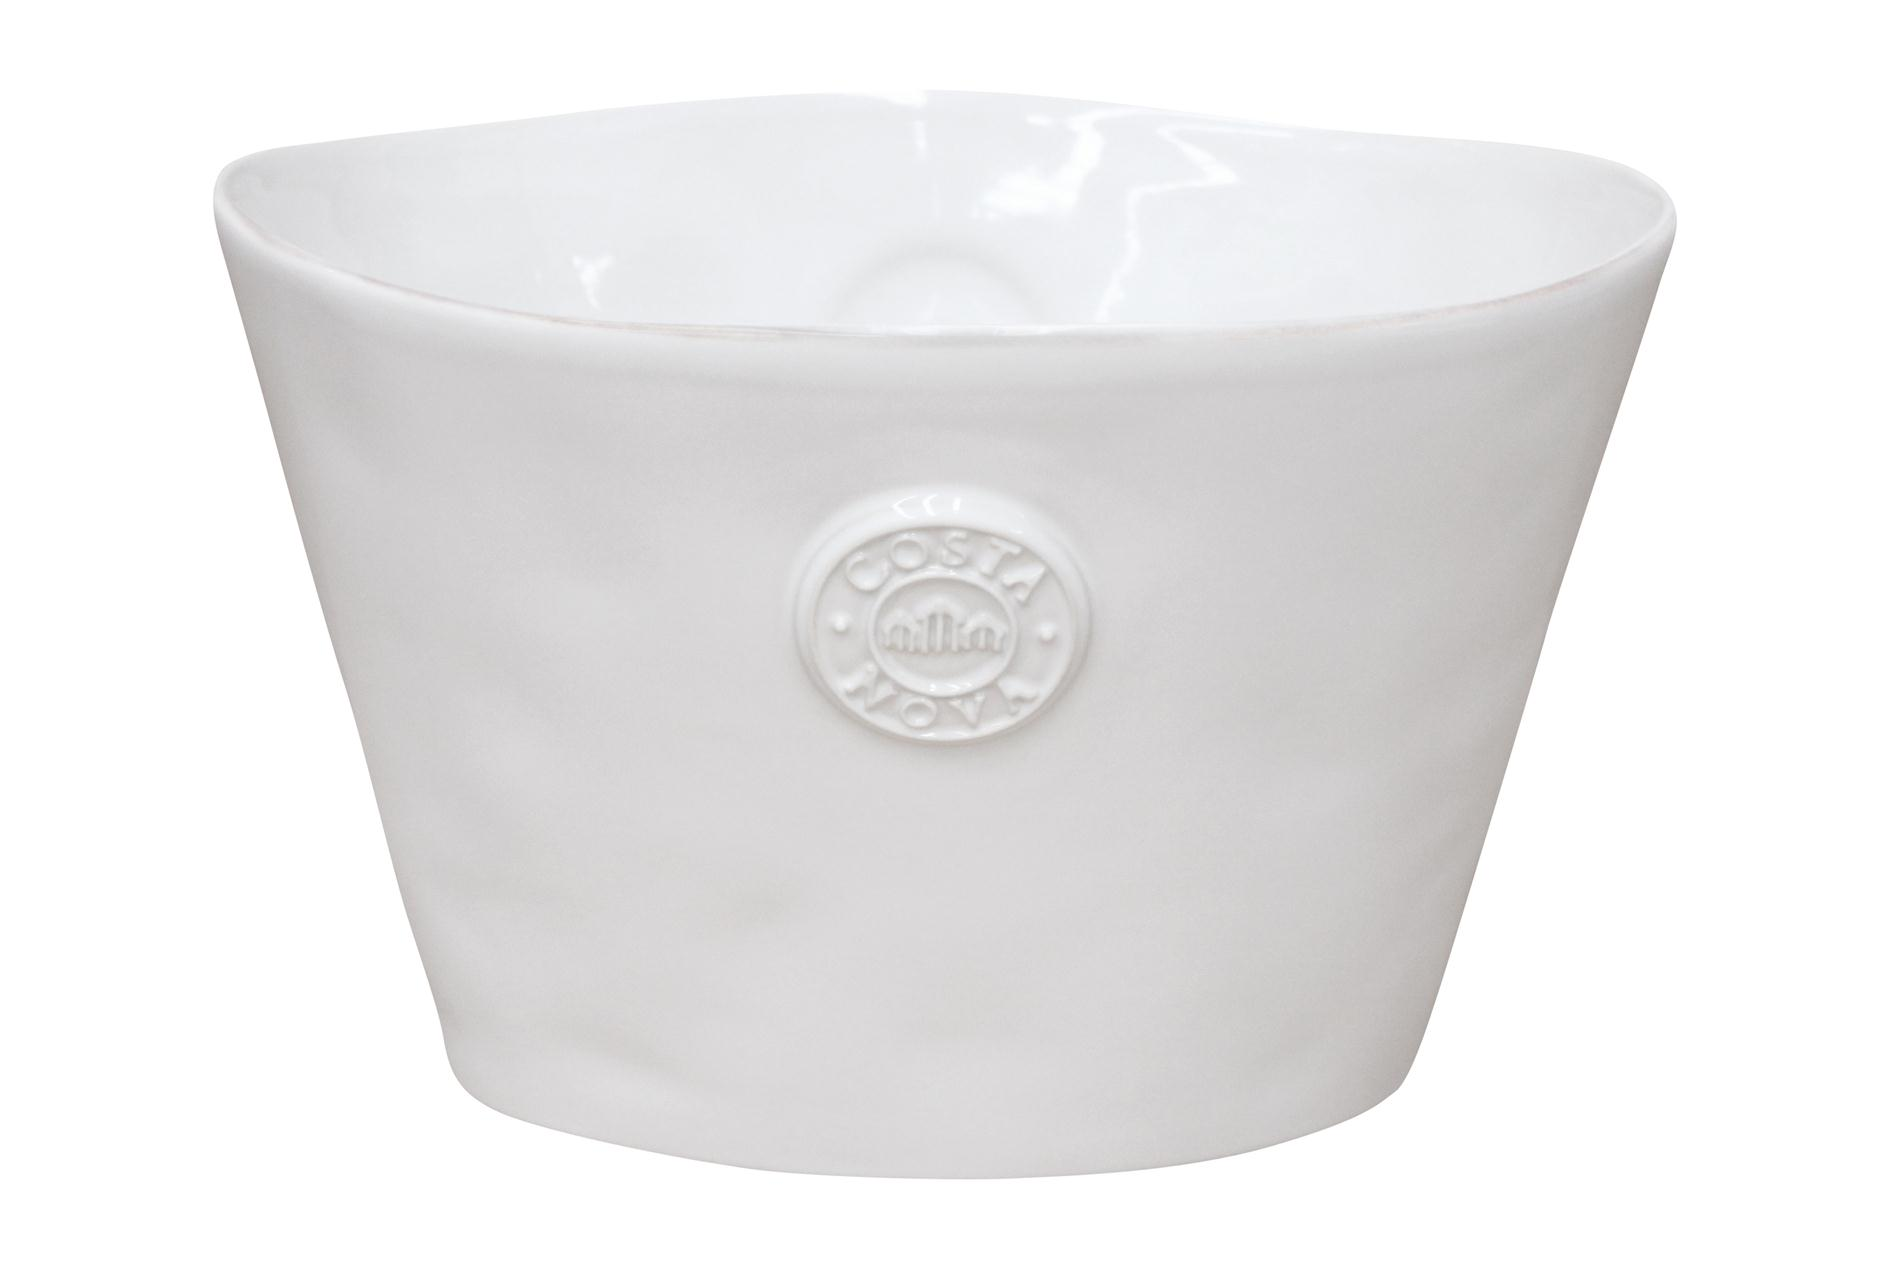 Costa Nova, Champagnerkühler/ Partybucket, Nova, weiß, 32 cm